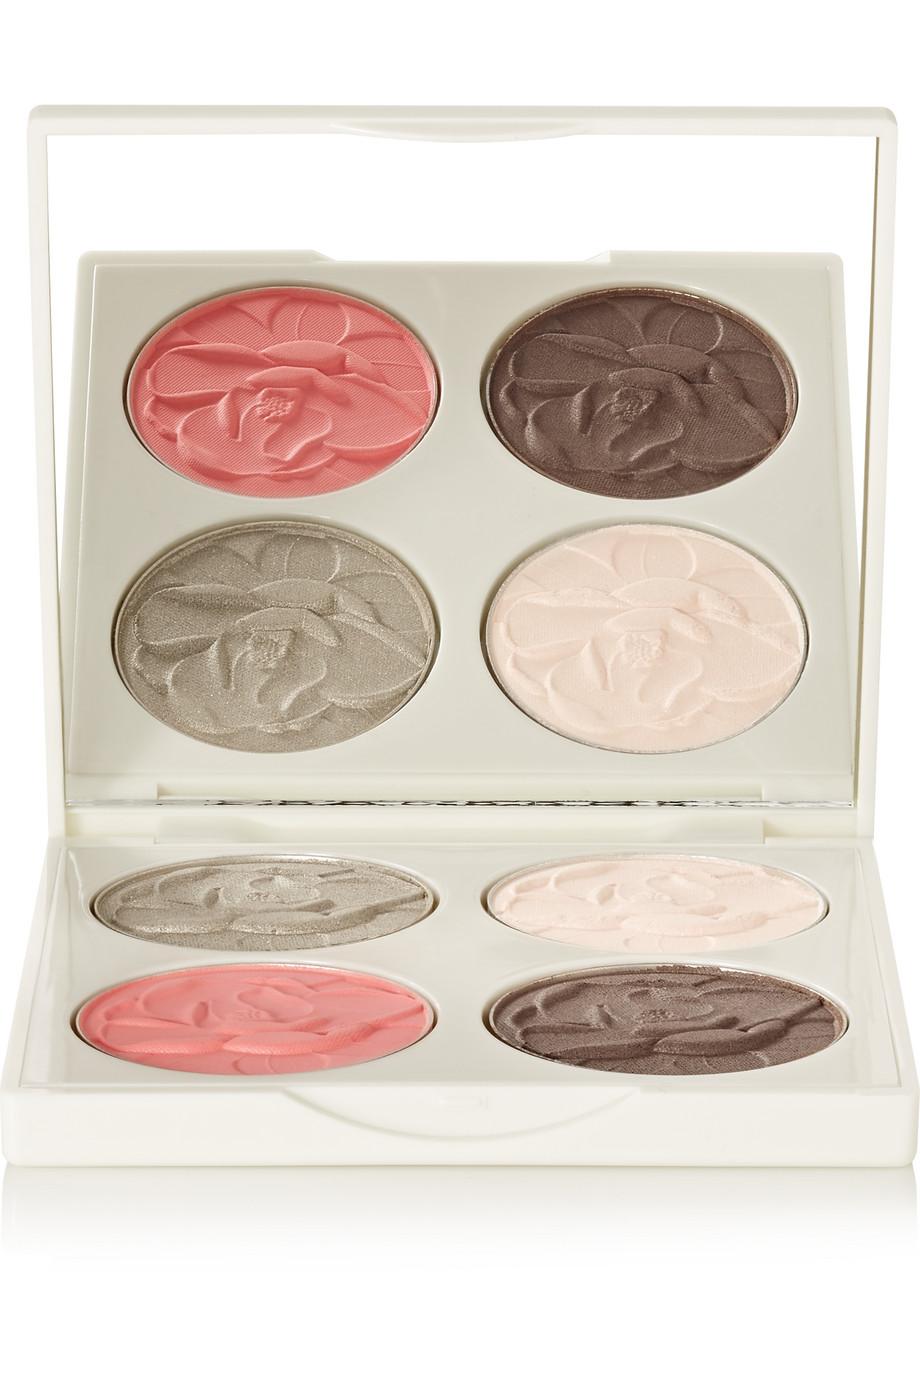 Le Magnoliaeye & Cheek Palette, by Chantecaille